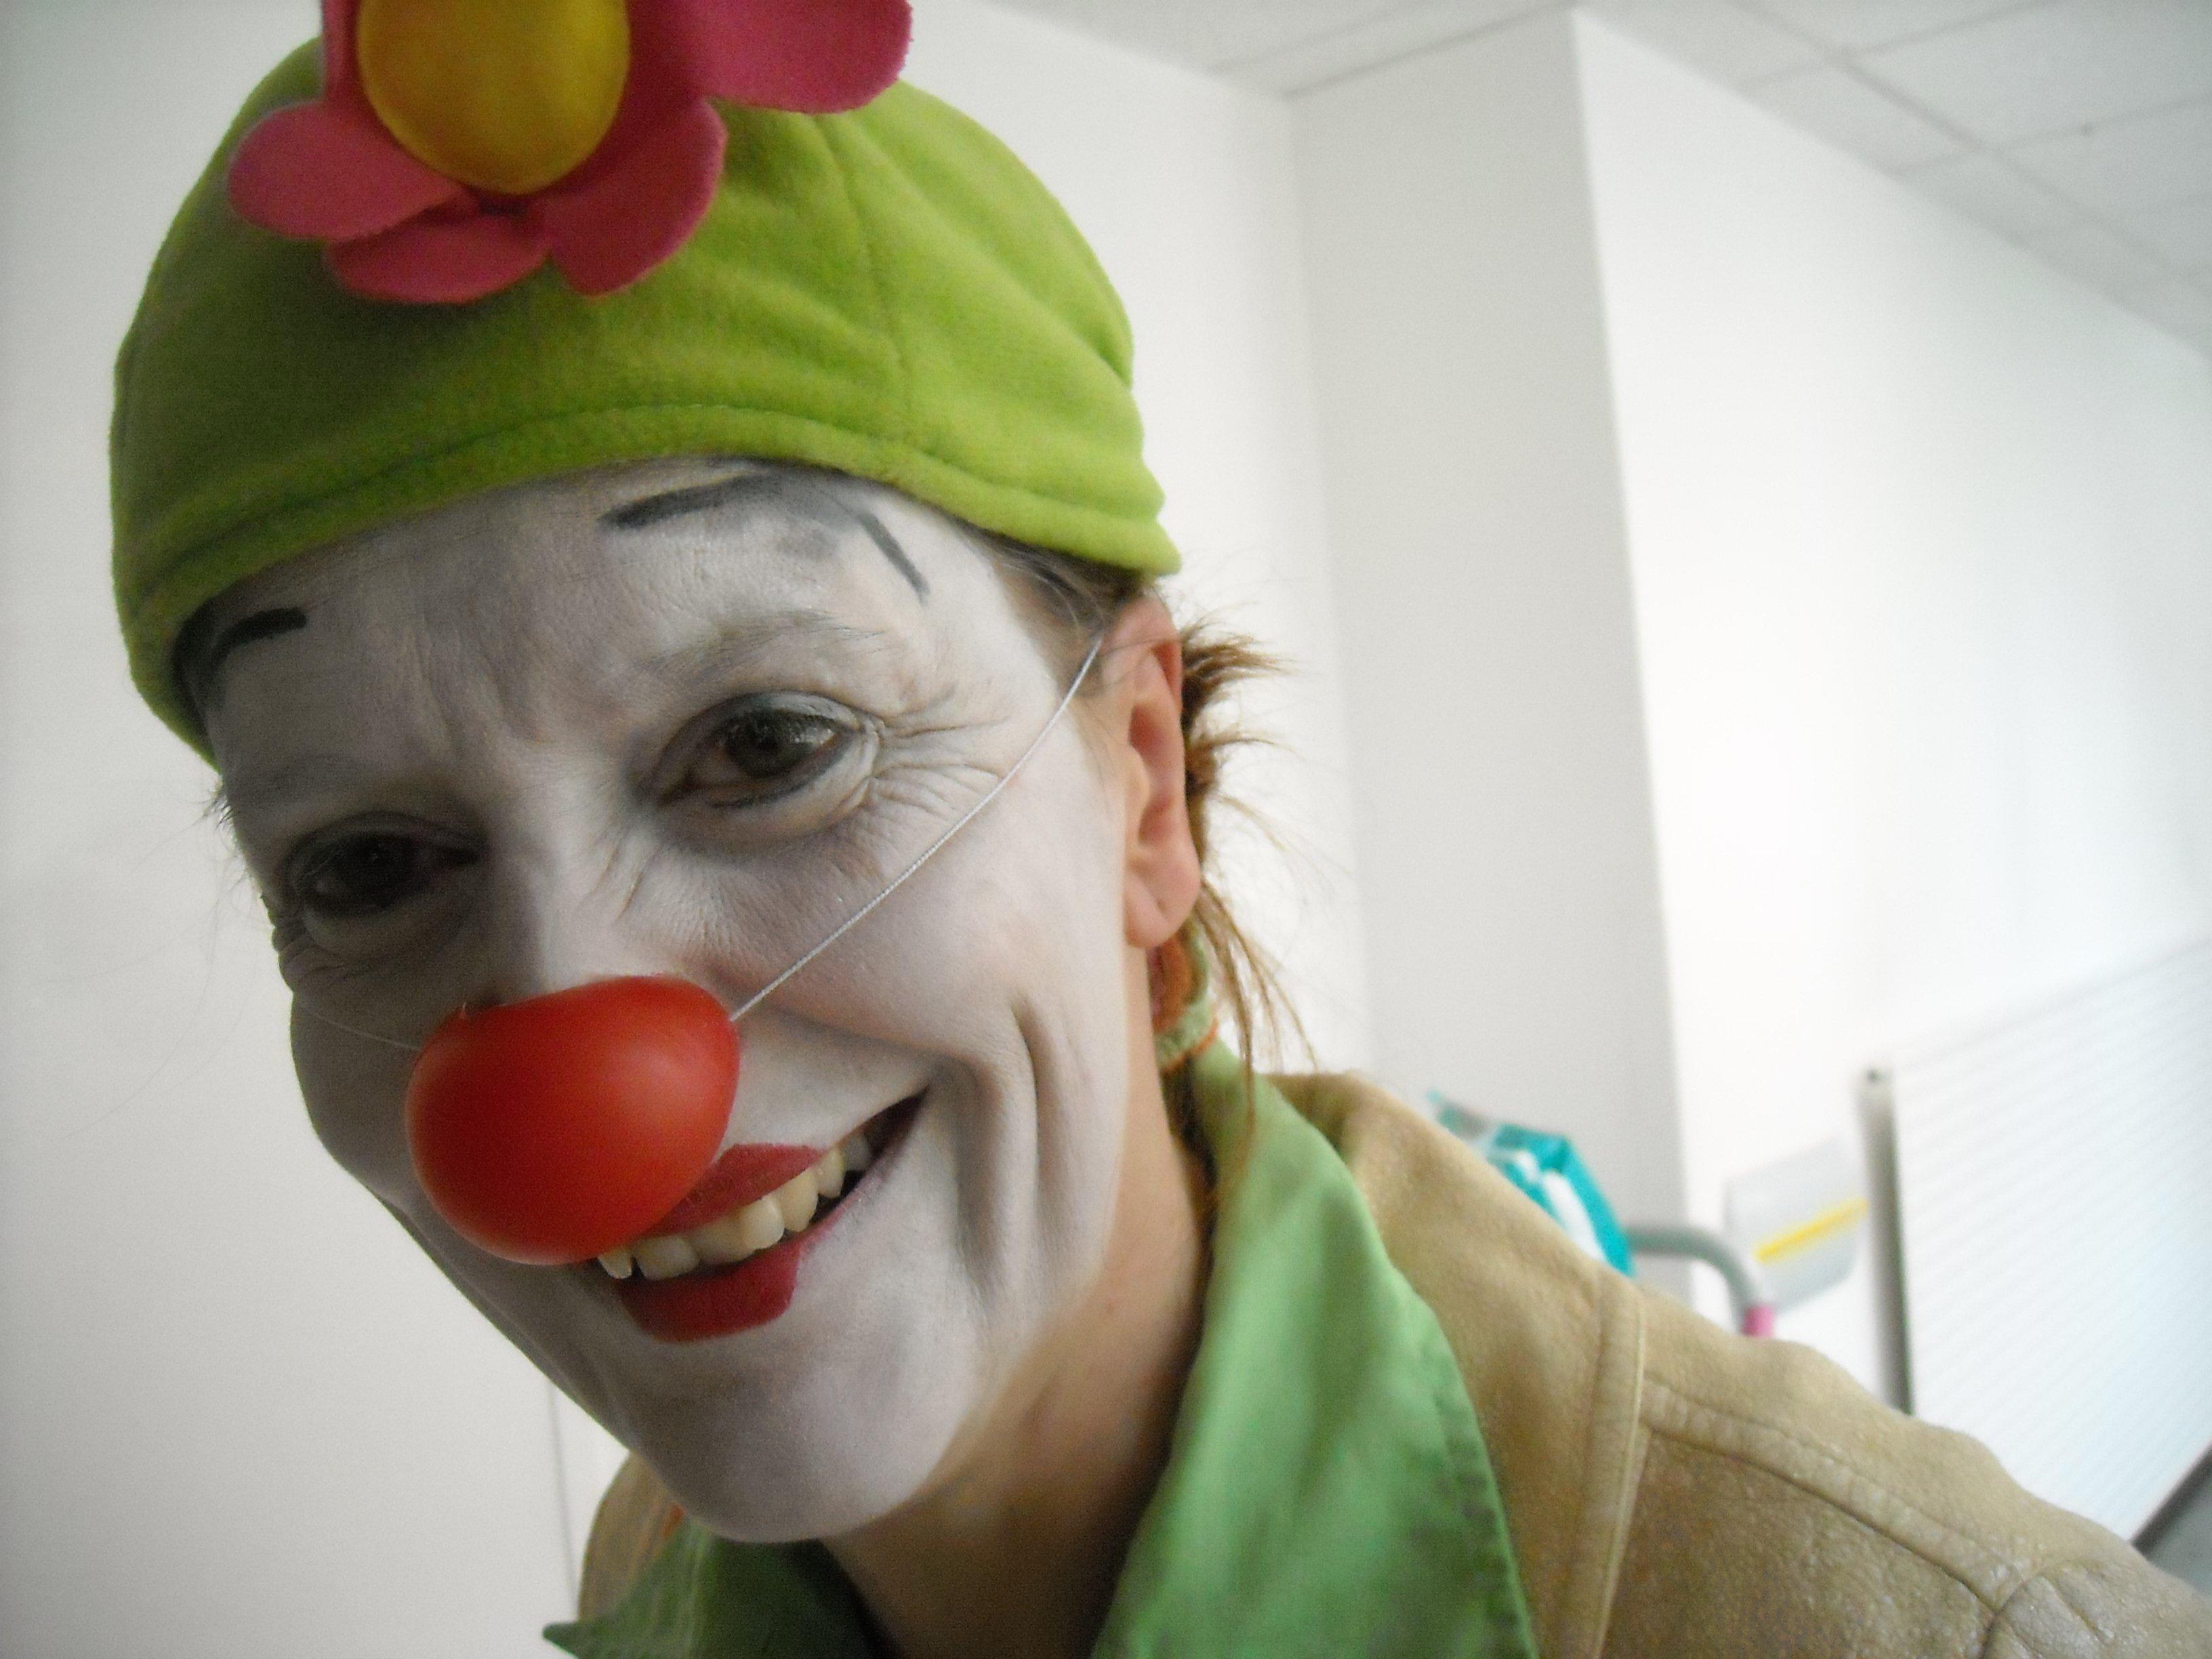 clownslhpital005.jpg